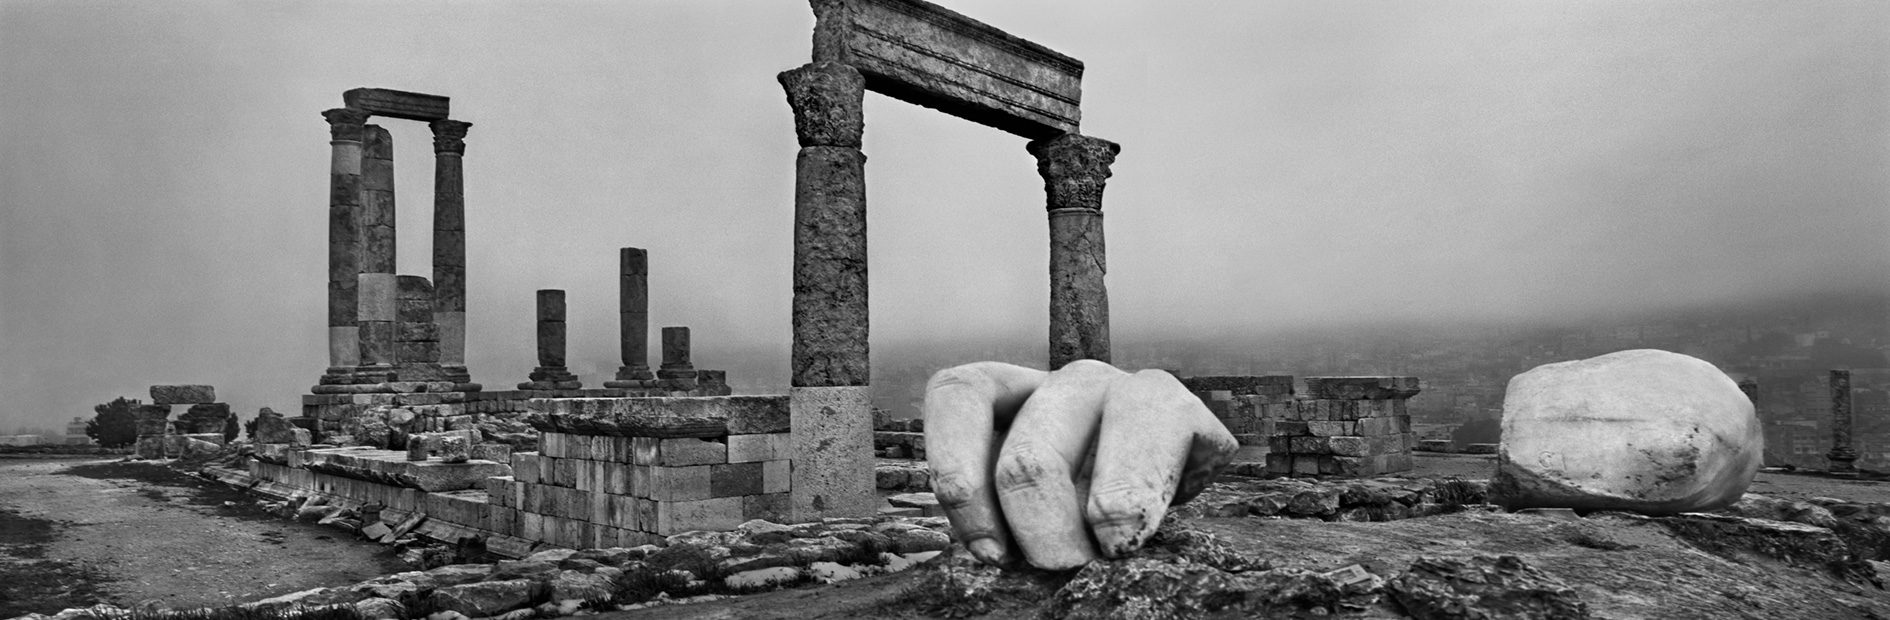 © Josef Koudelka / Magnum Photos